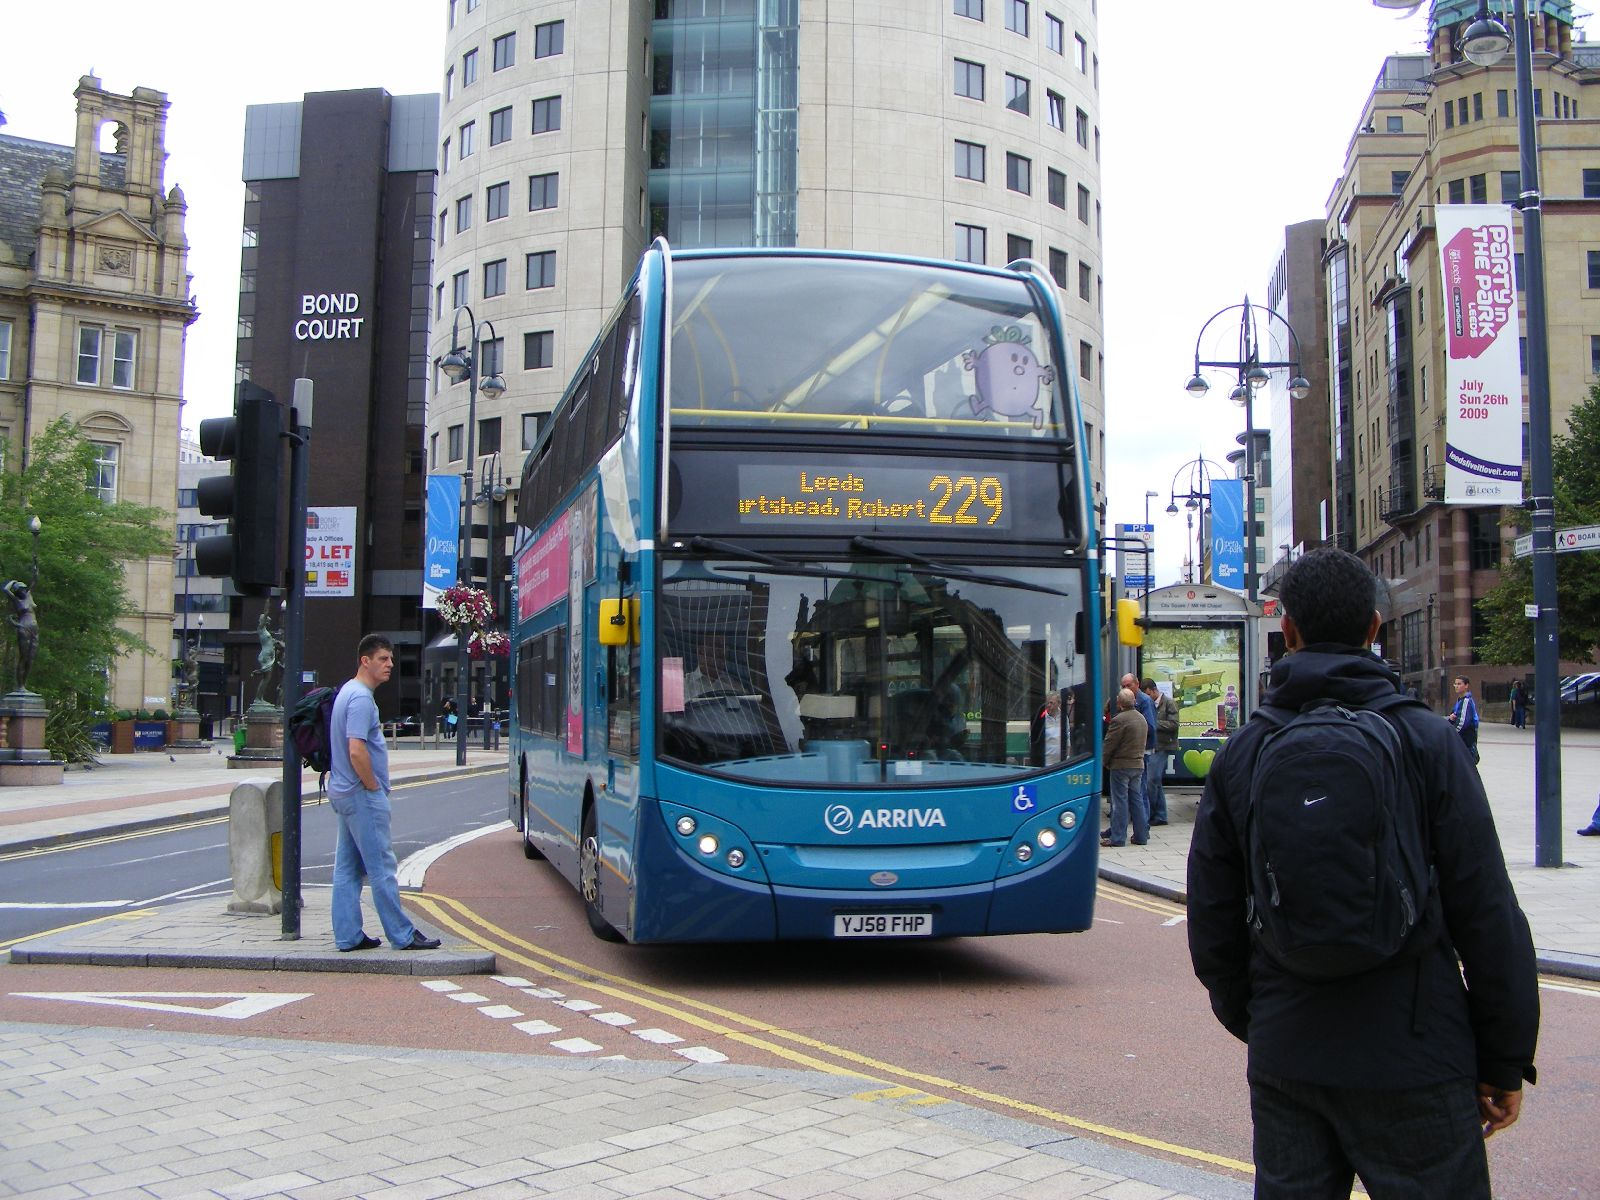 Arriva Yorkshire - Wikipedia